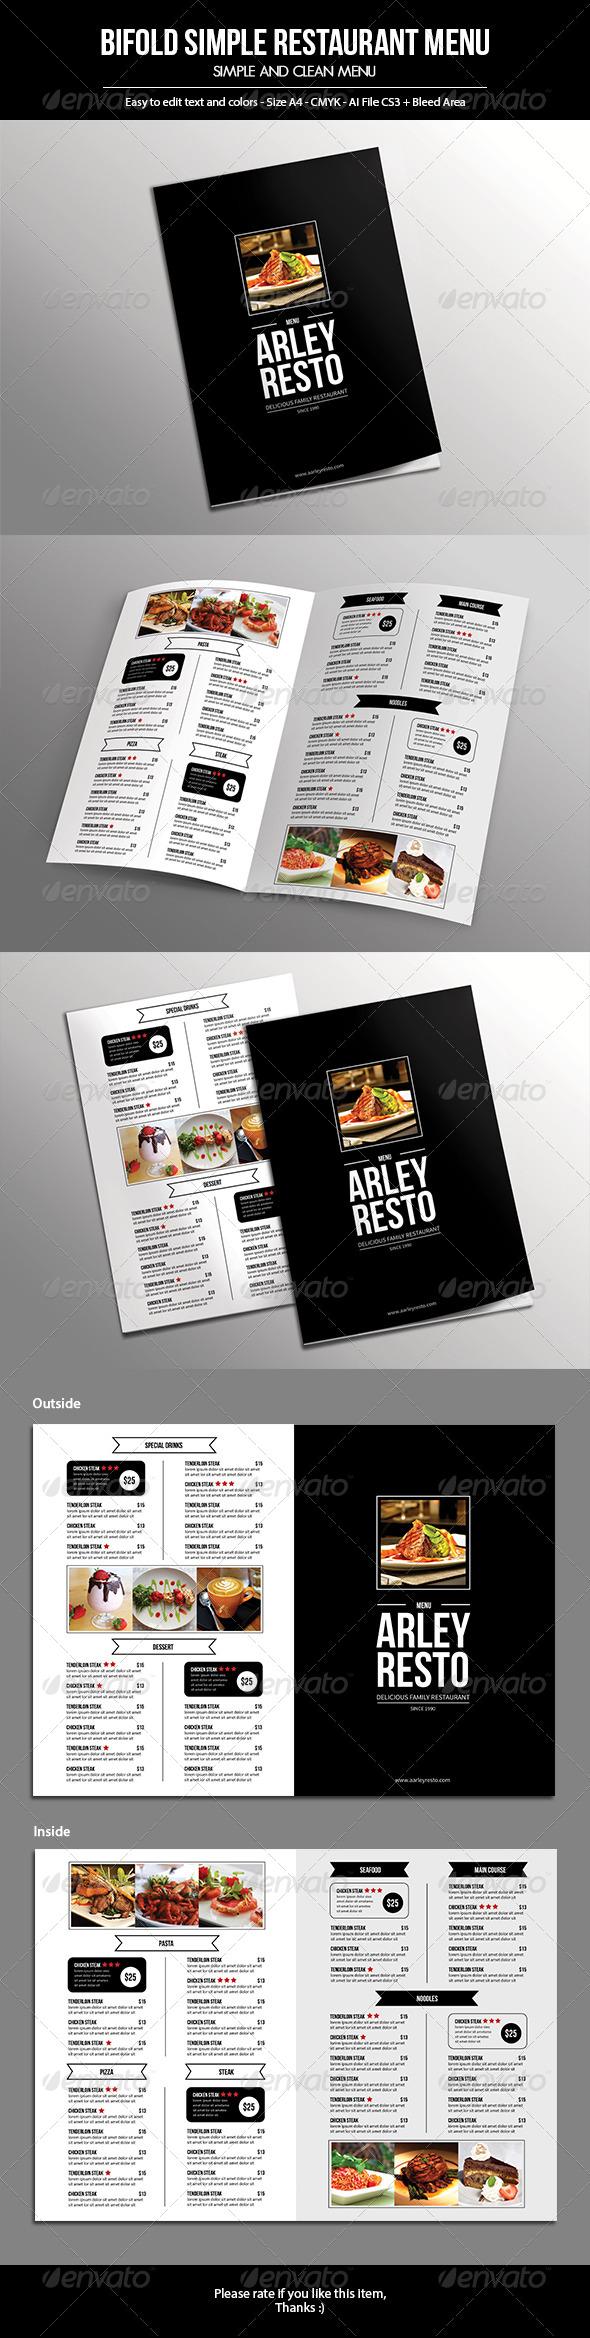 GraphicRiver Bifold Simple Restaurant Menu 7511716